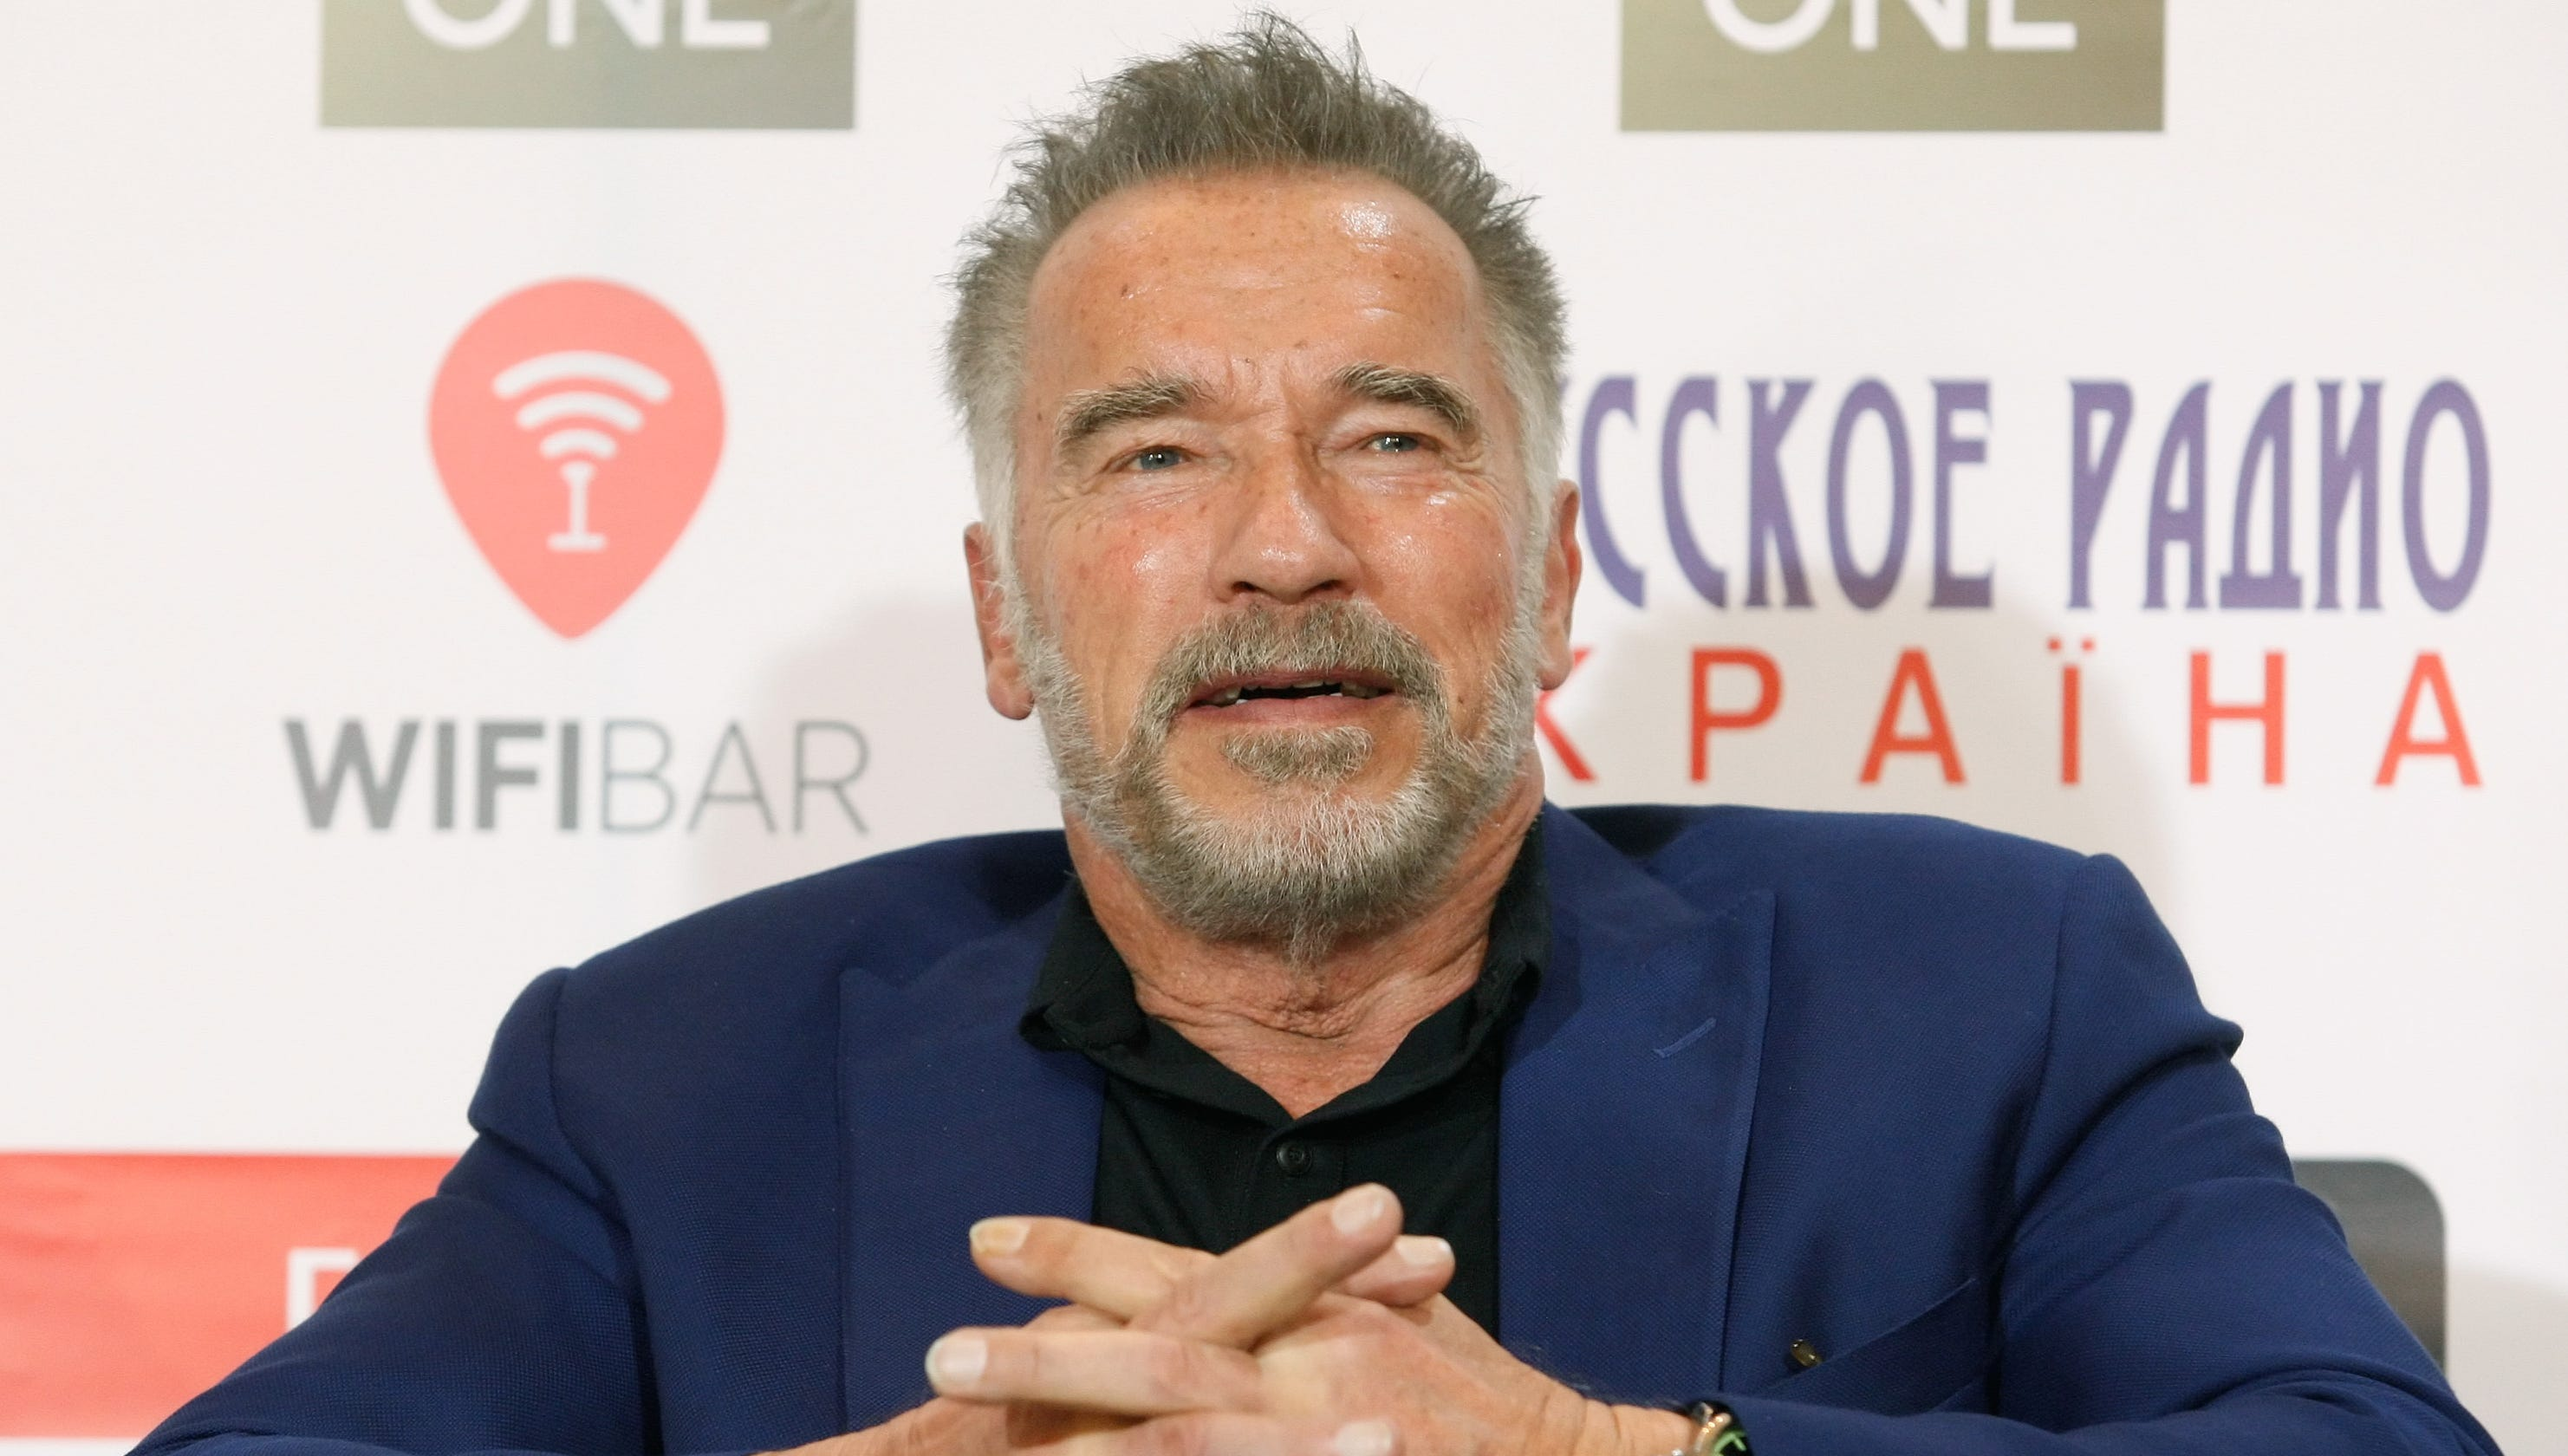 Arnold Schwarzenegger's son Joseph Baena re-creates his iconic pose